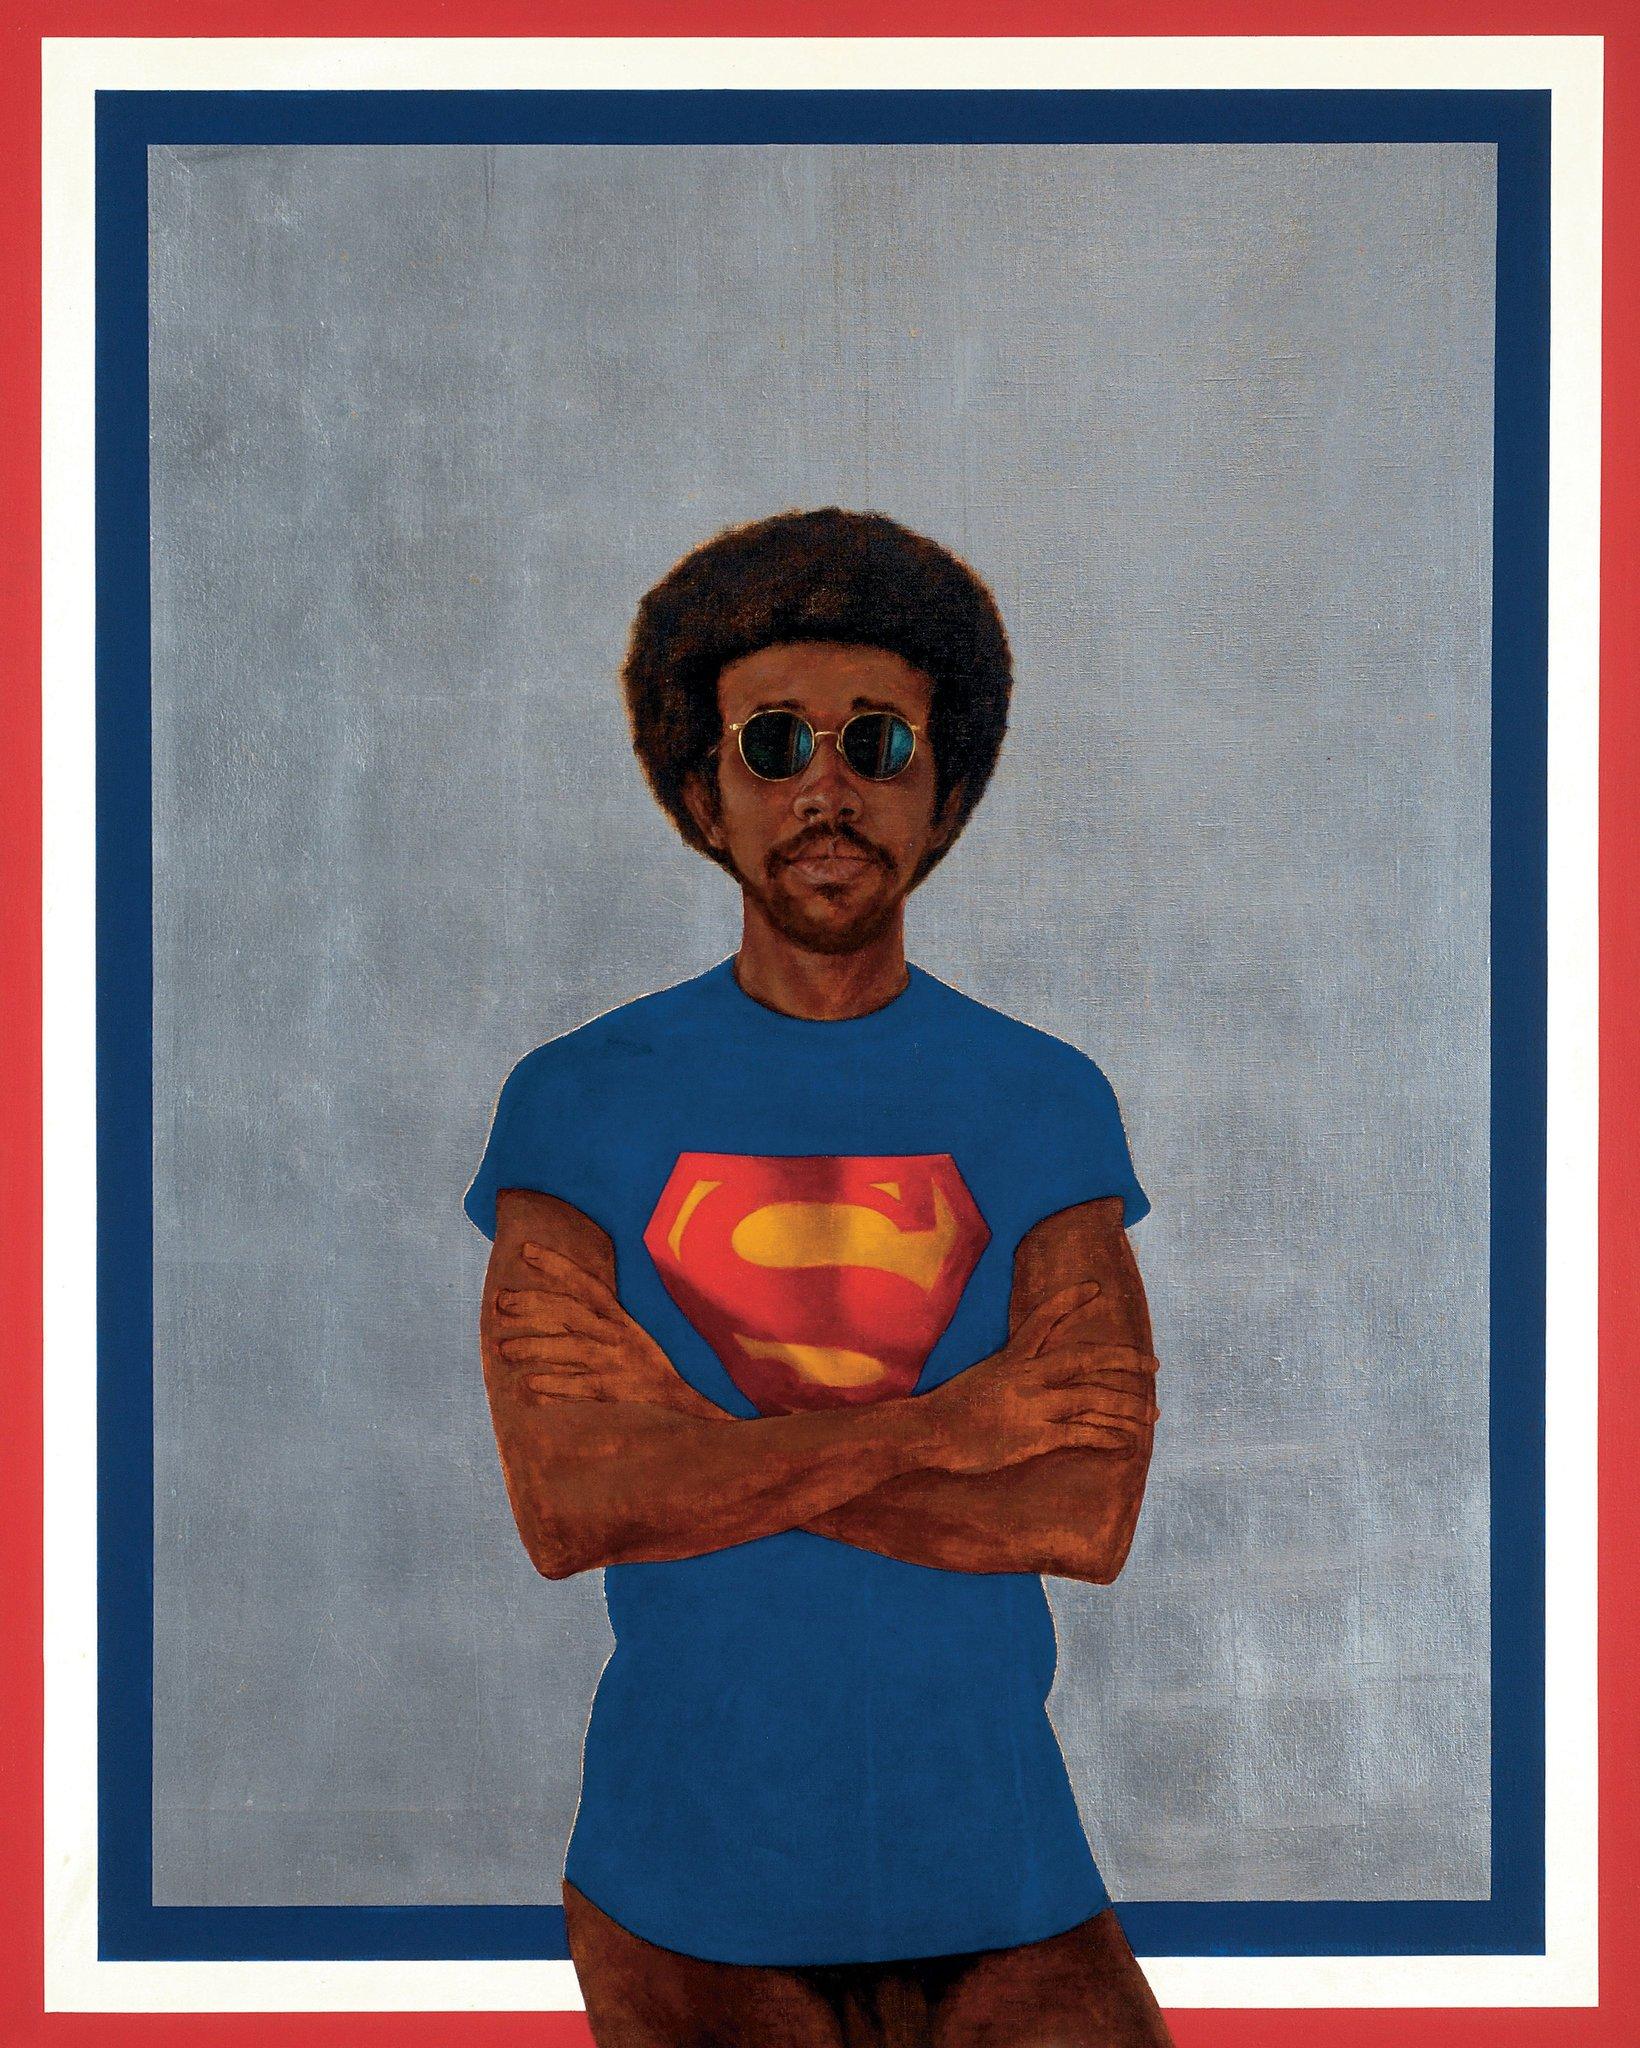 Barkley L. Hendrick's Icon for  My Man Superman (Superman Never Saved Any Black People - Bobby Seale ) Image Credit:Jack Shainman Gallery, NY.